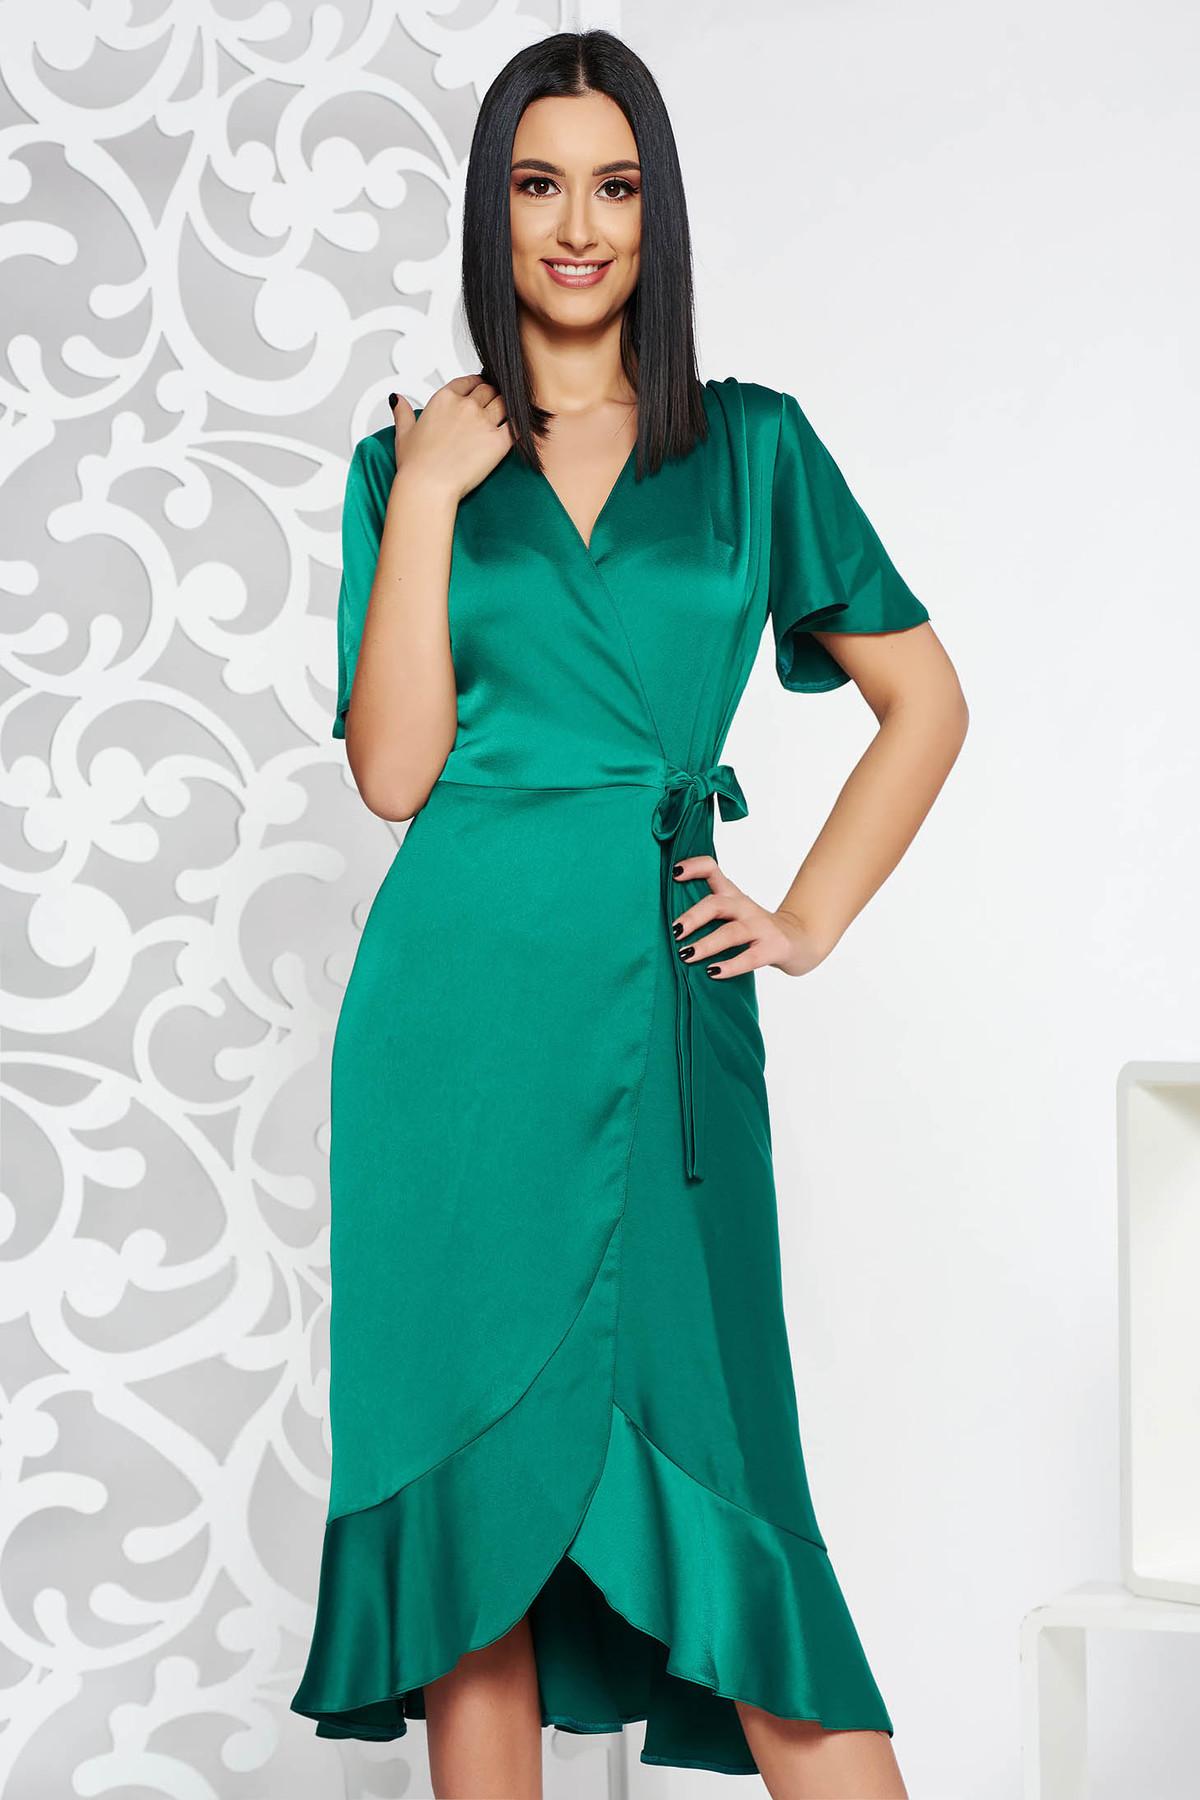 Rochie verde de ocazie petrecuta din stofa neelastica subtire cu volanase la baza rochiei